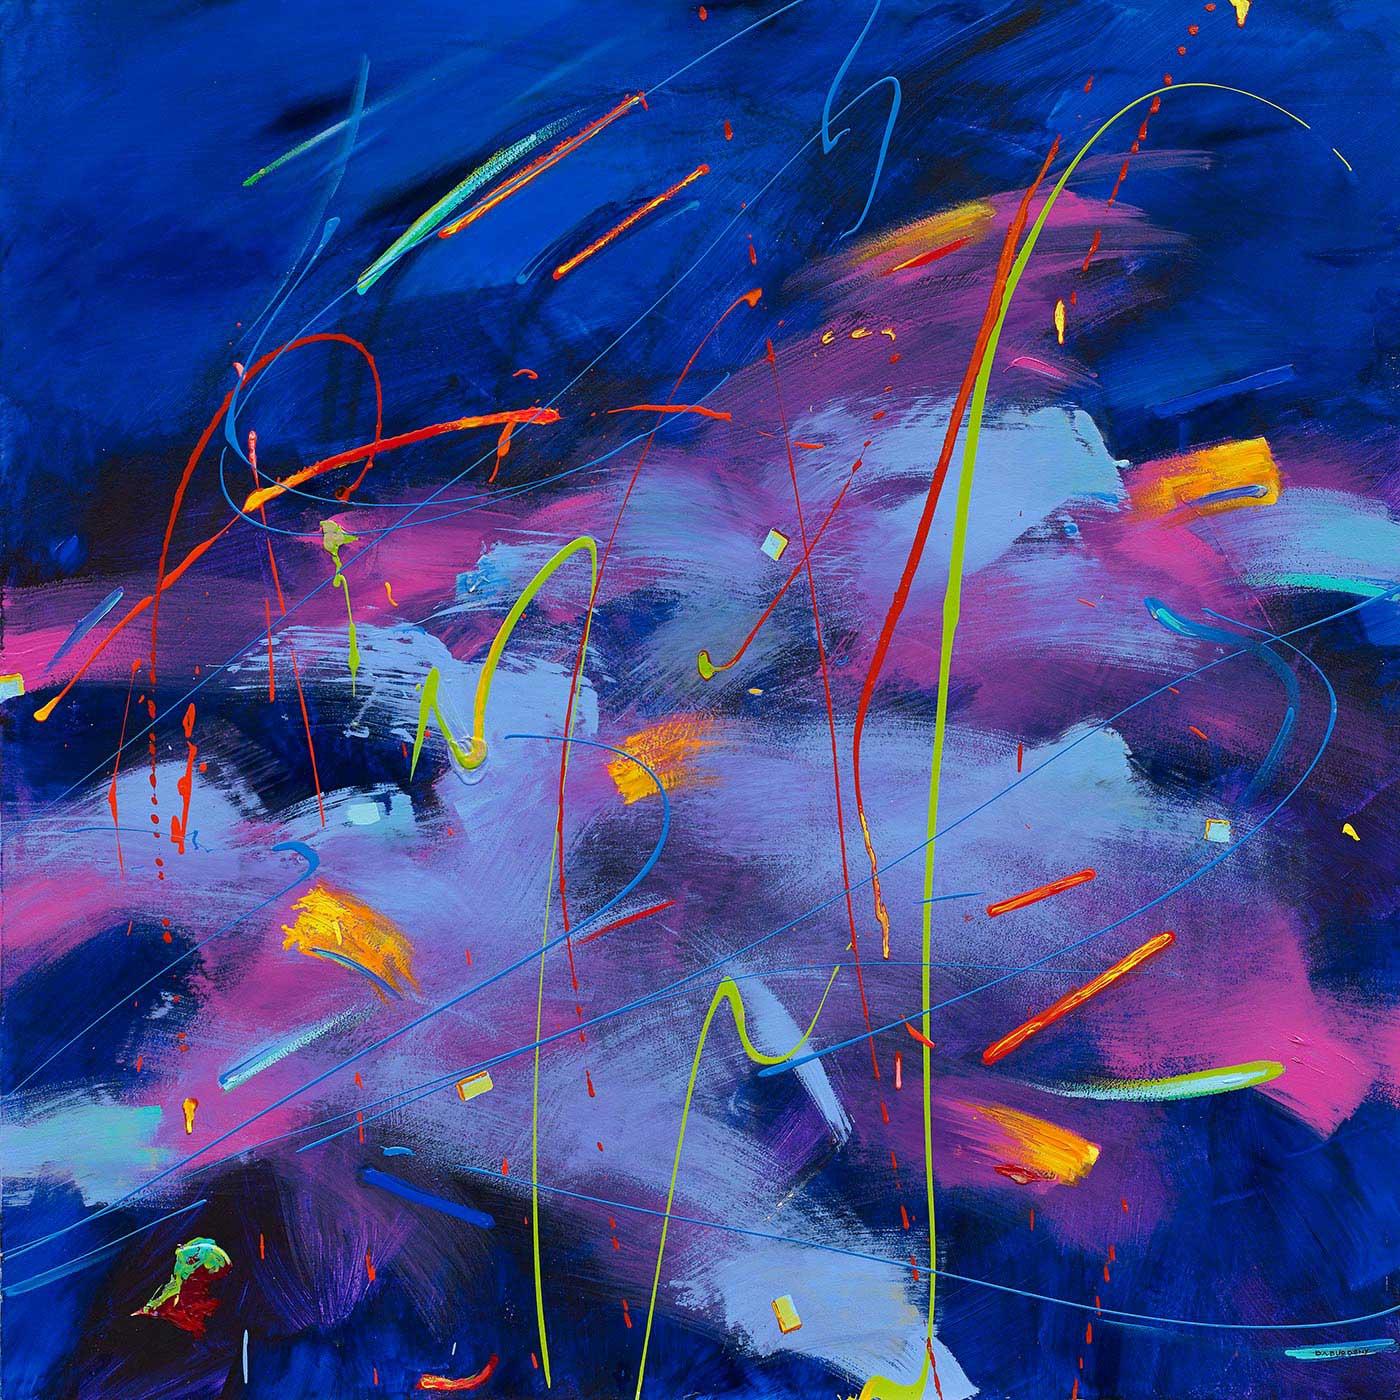 Barry A. Burdeny - Cloud Nine